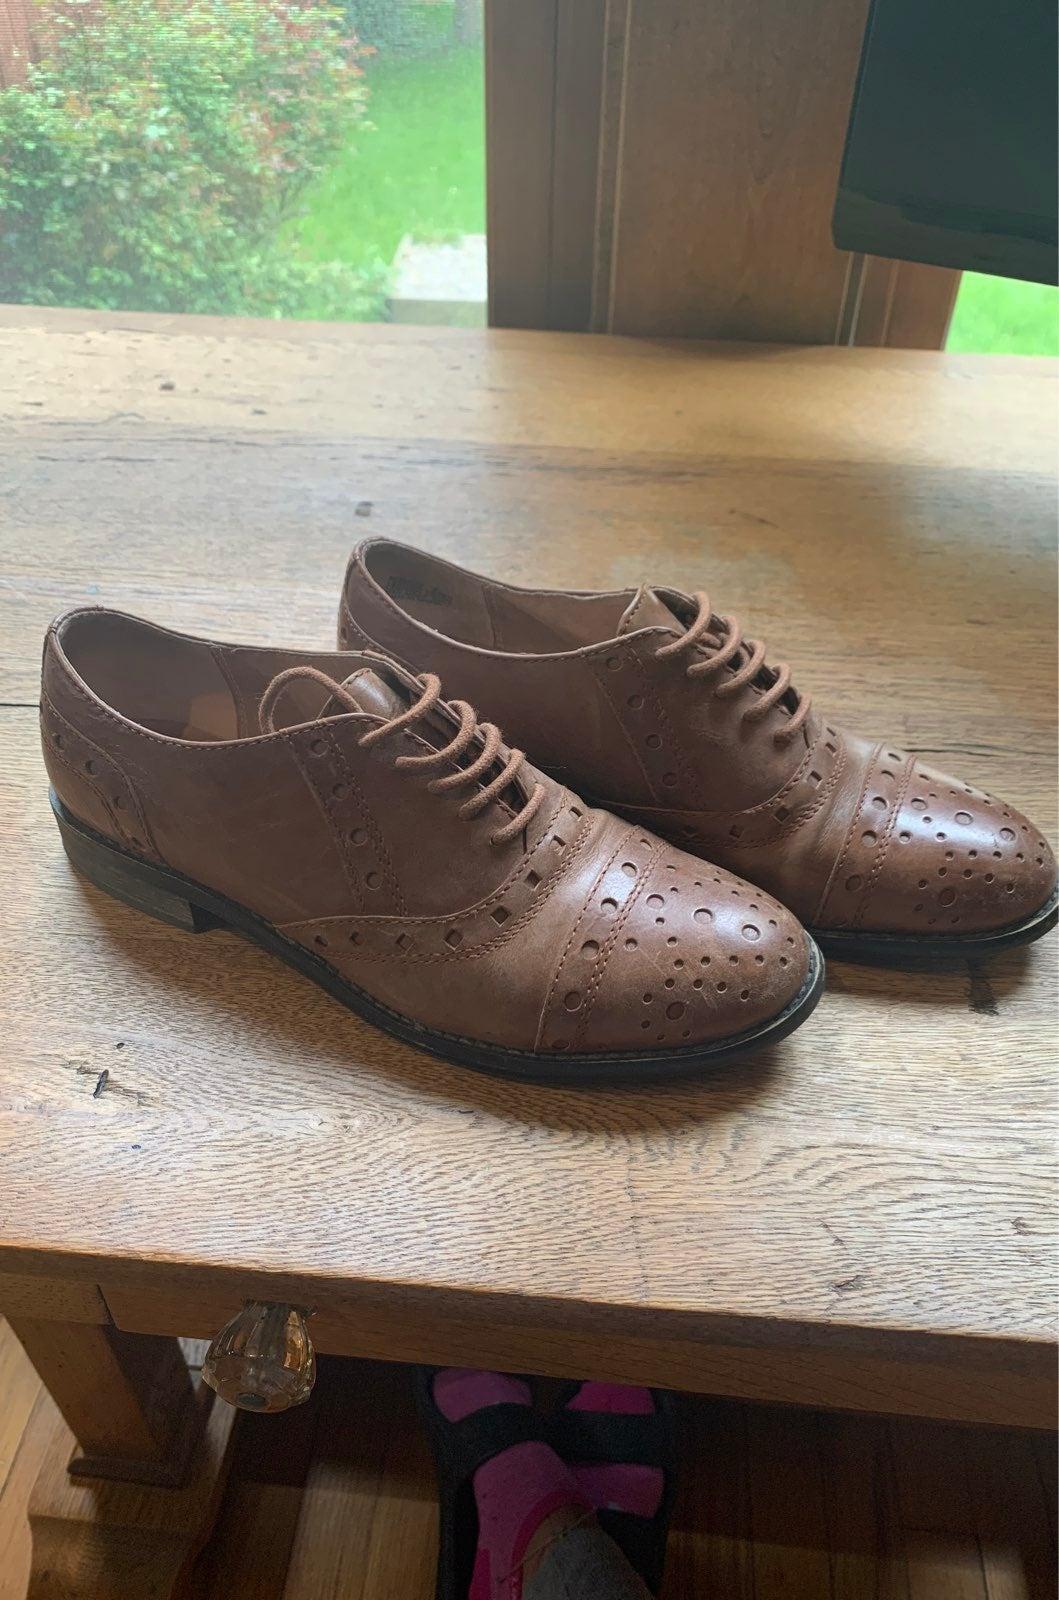 Miz mooz brown leather lace up shoe